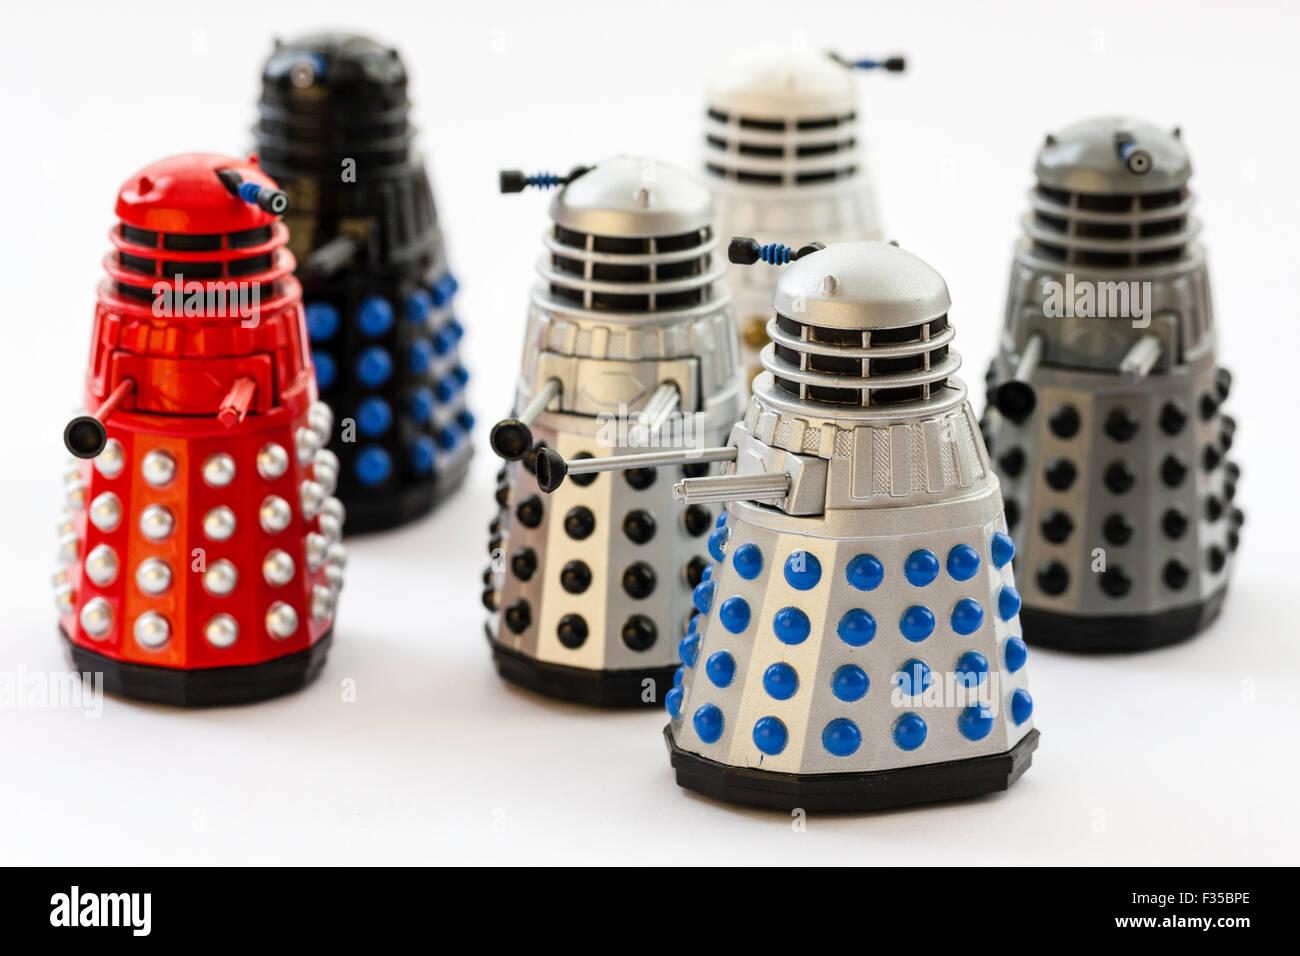 BBC TV series, Doctor Who, six model toy metal Daleks on plain background - Stock Image